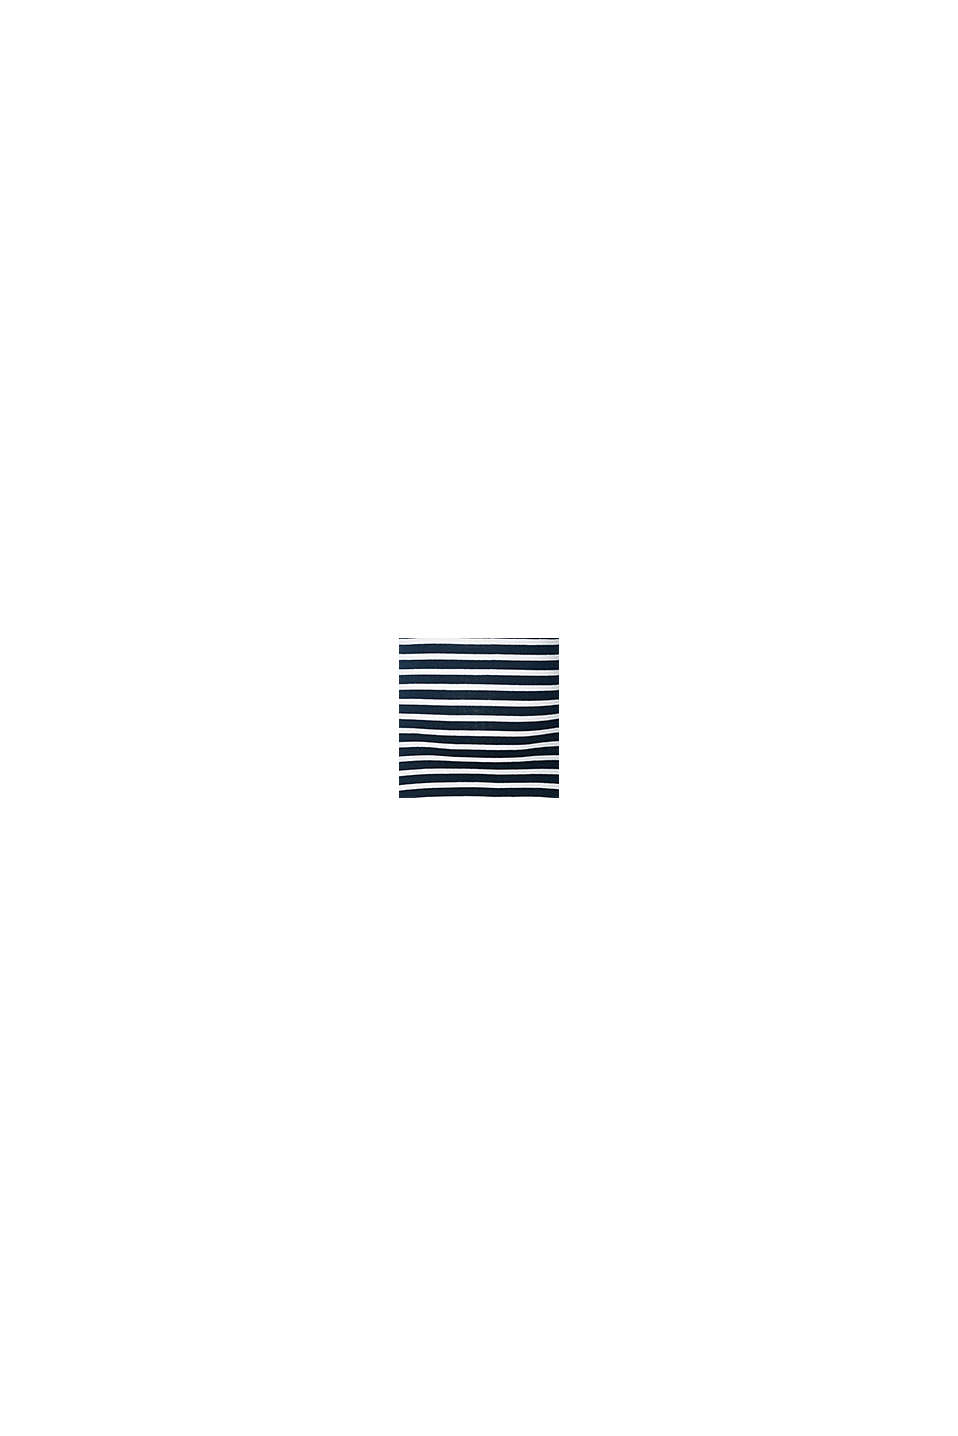 Fintstrikket sweater i 100% bomuld, NIGHT BLUE, swatch